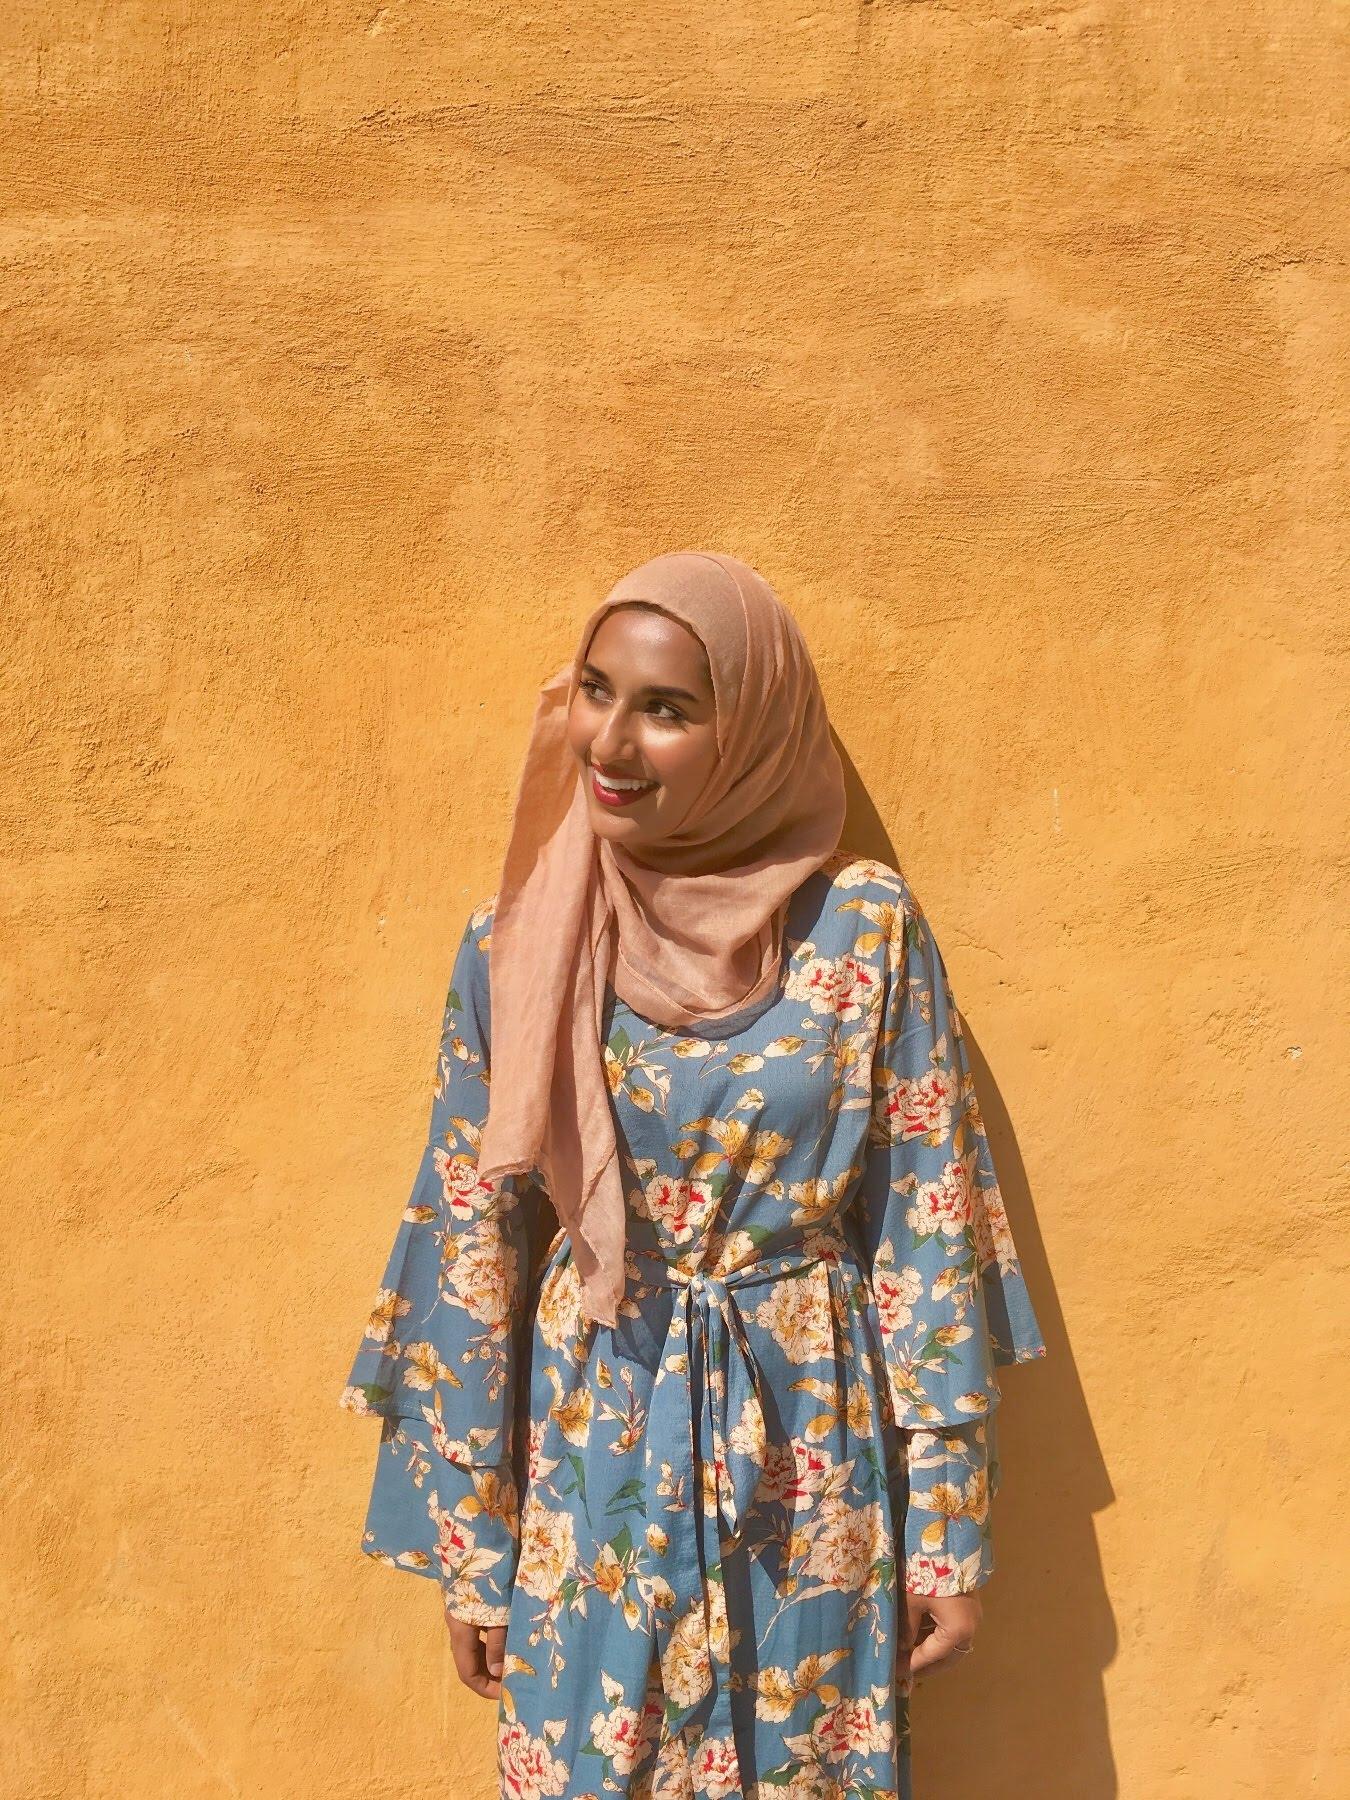 Floral Blue dress from Shein Rafa Farihah Glowing